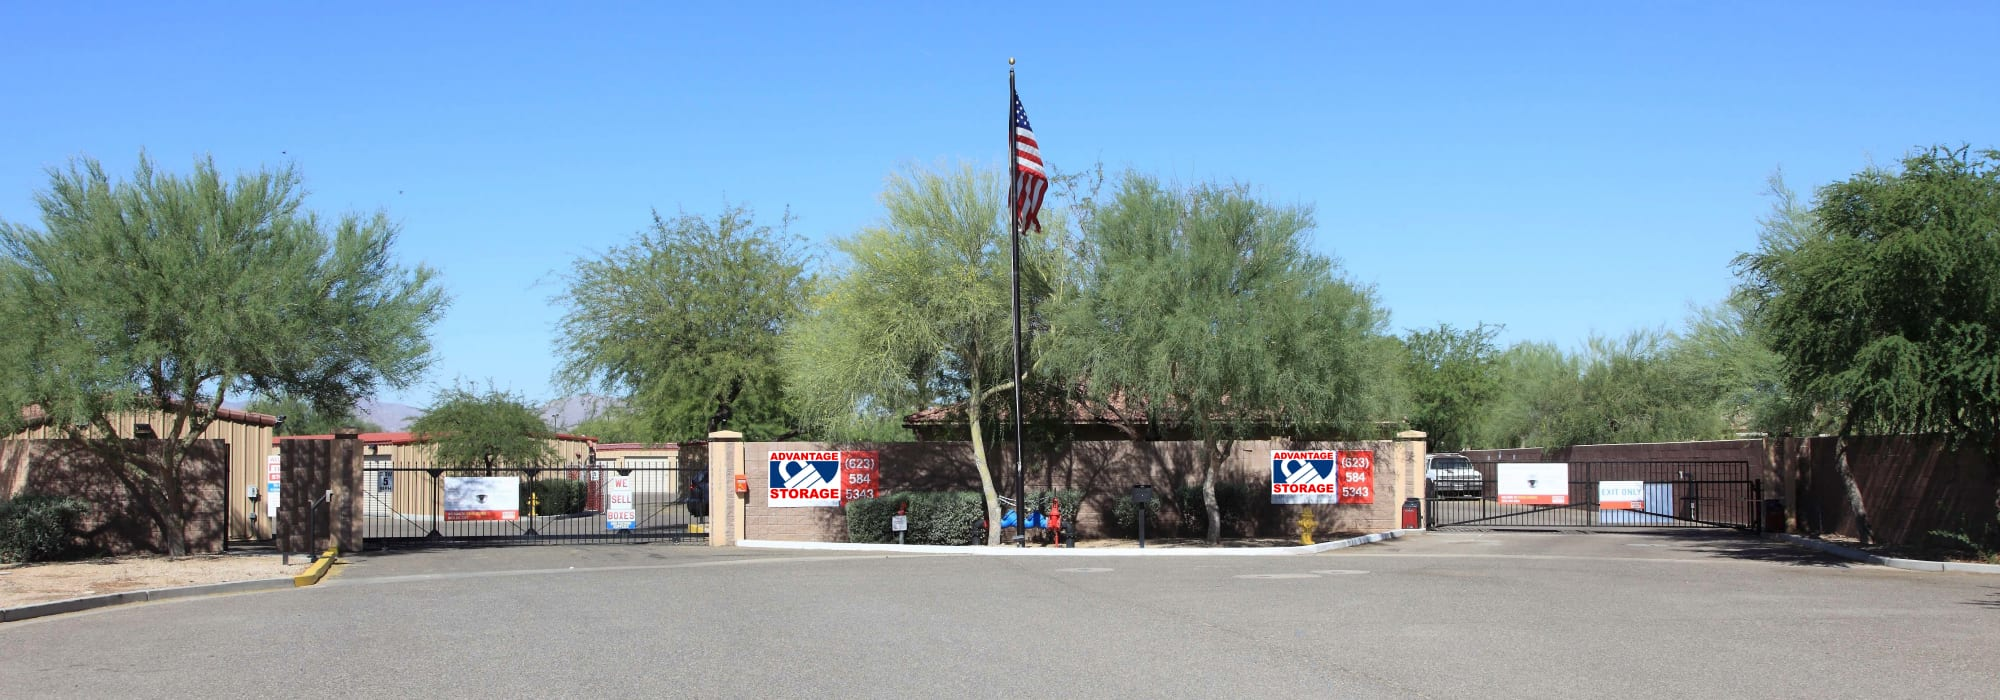 Self storage in Surprise, Arizona